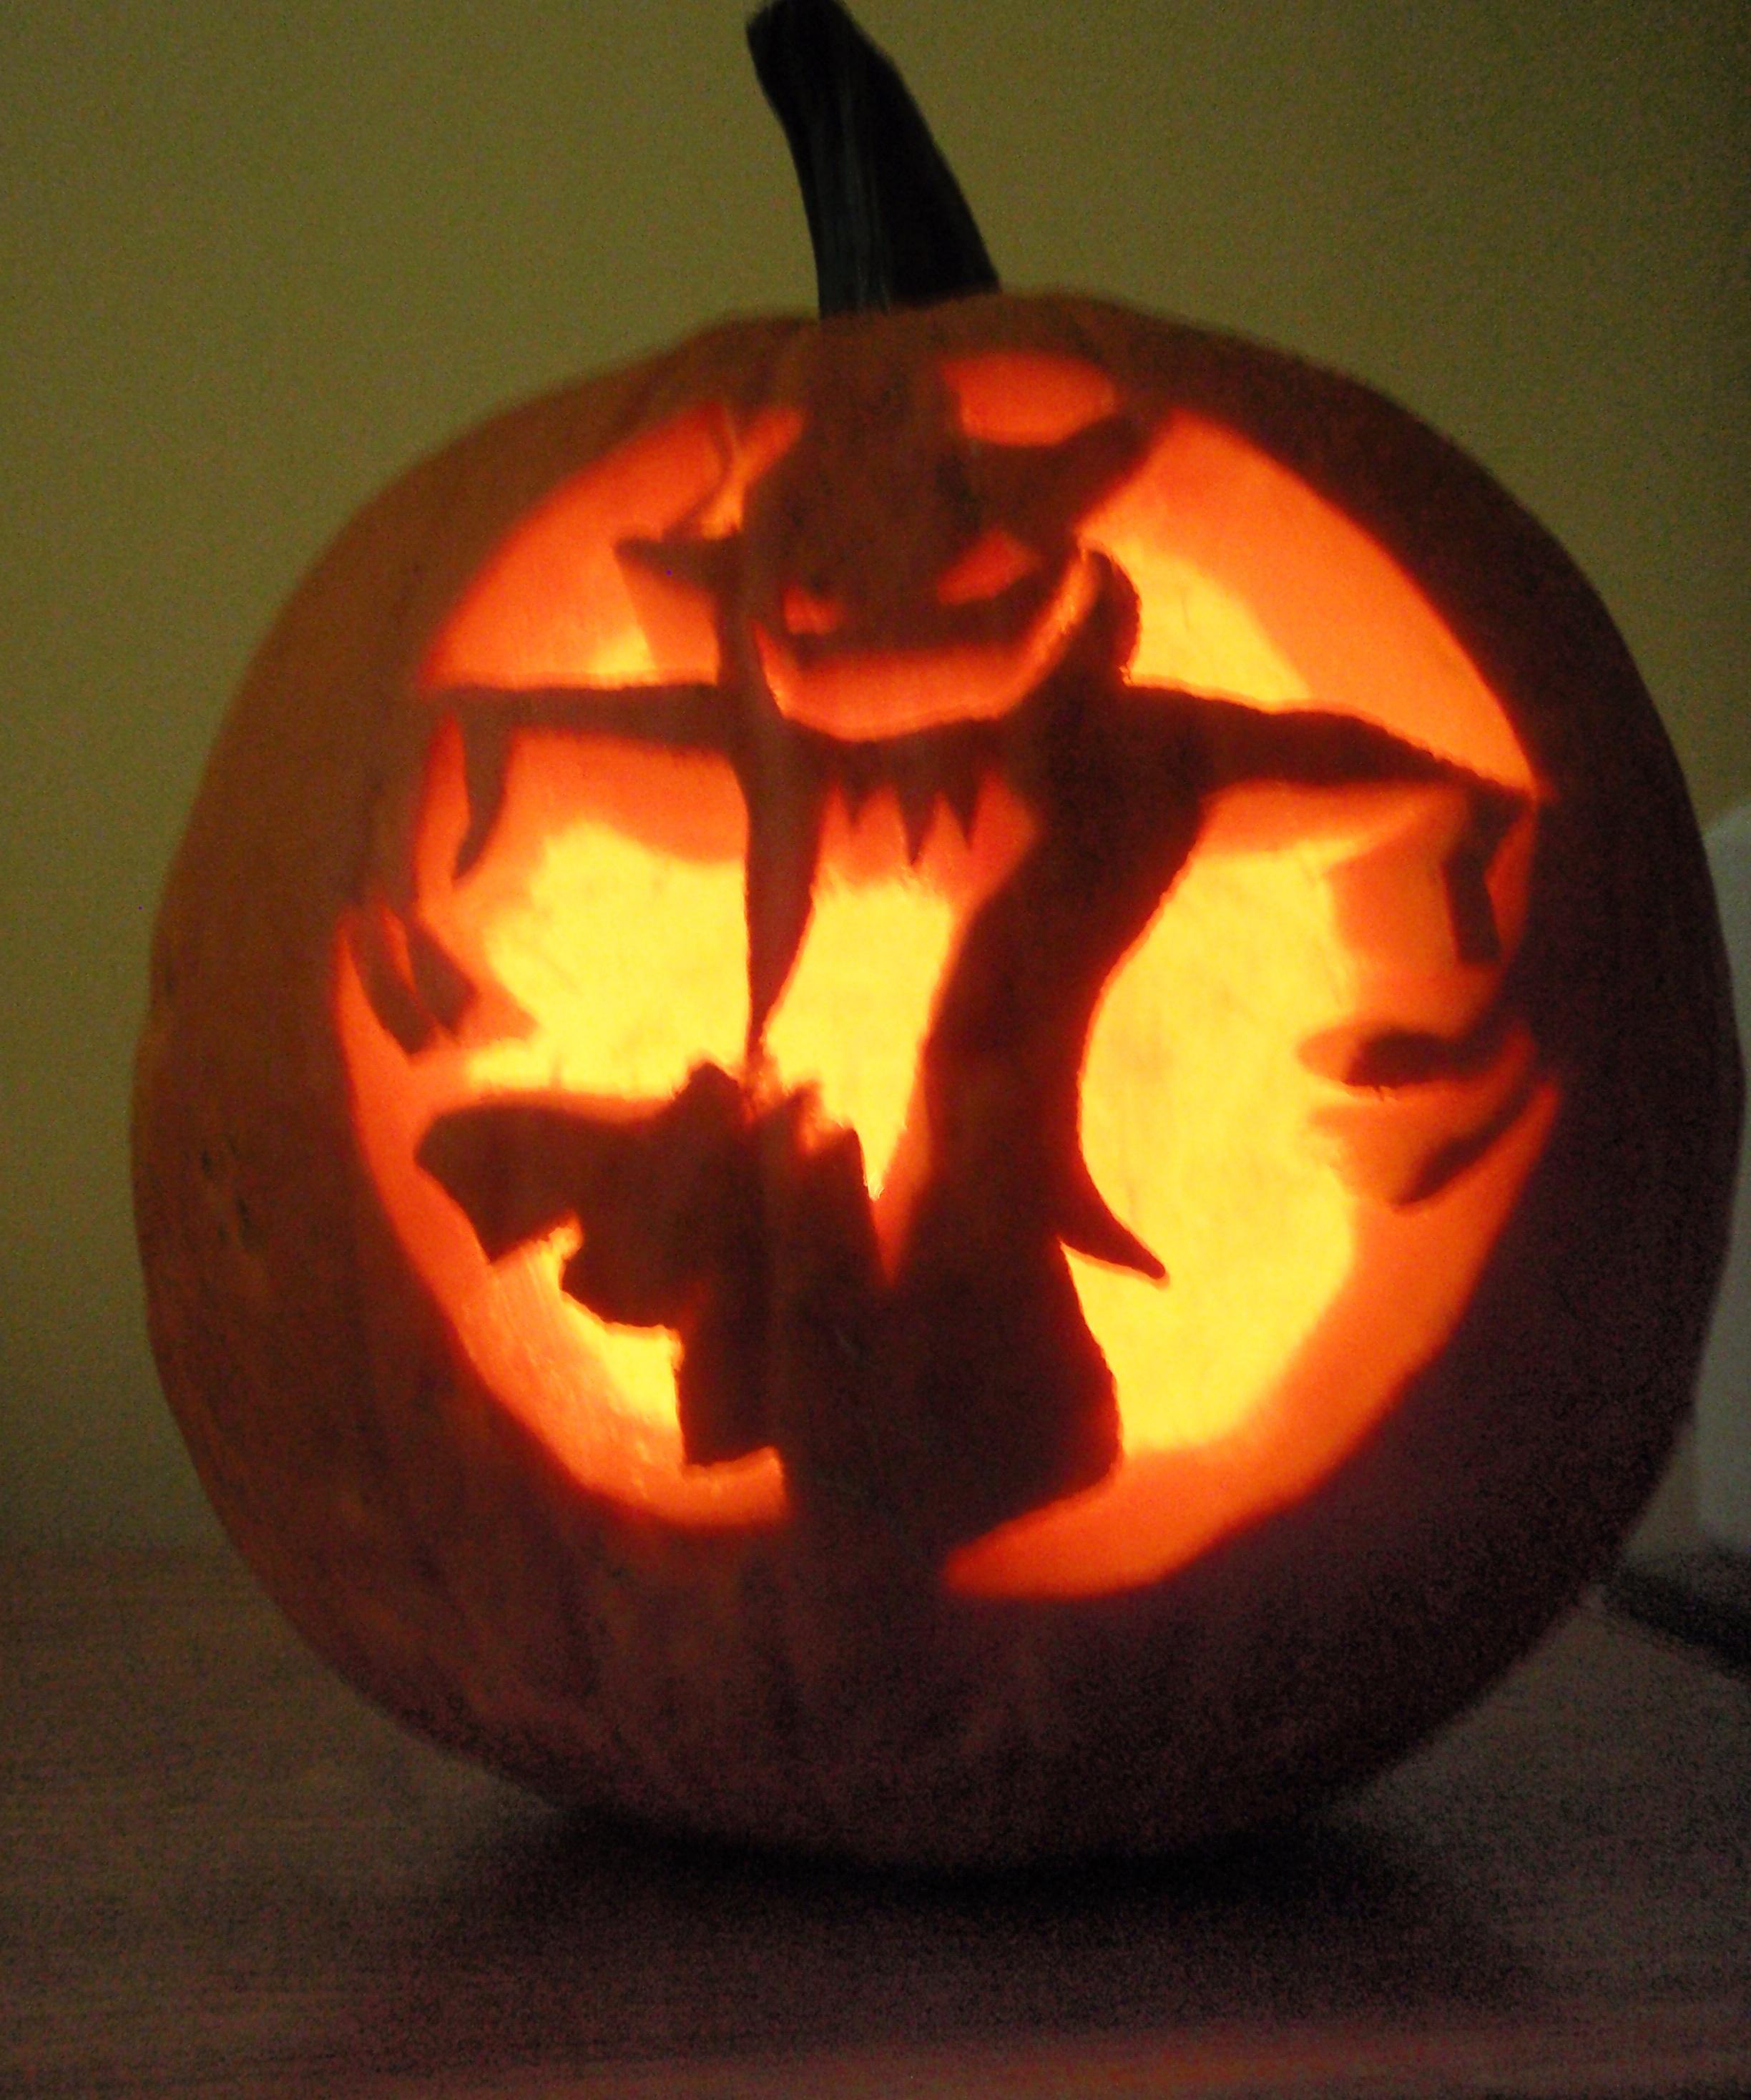 Virginia pumpkin carving st class sleep diagnostics